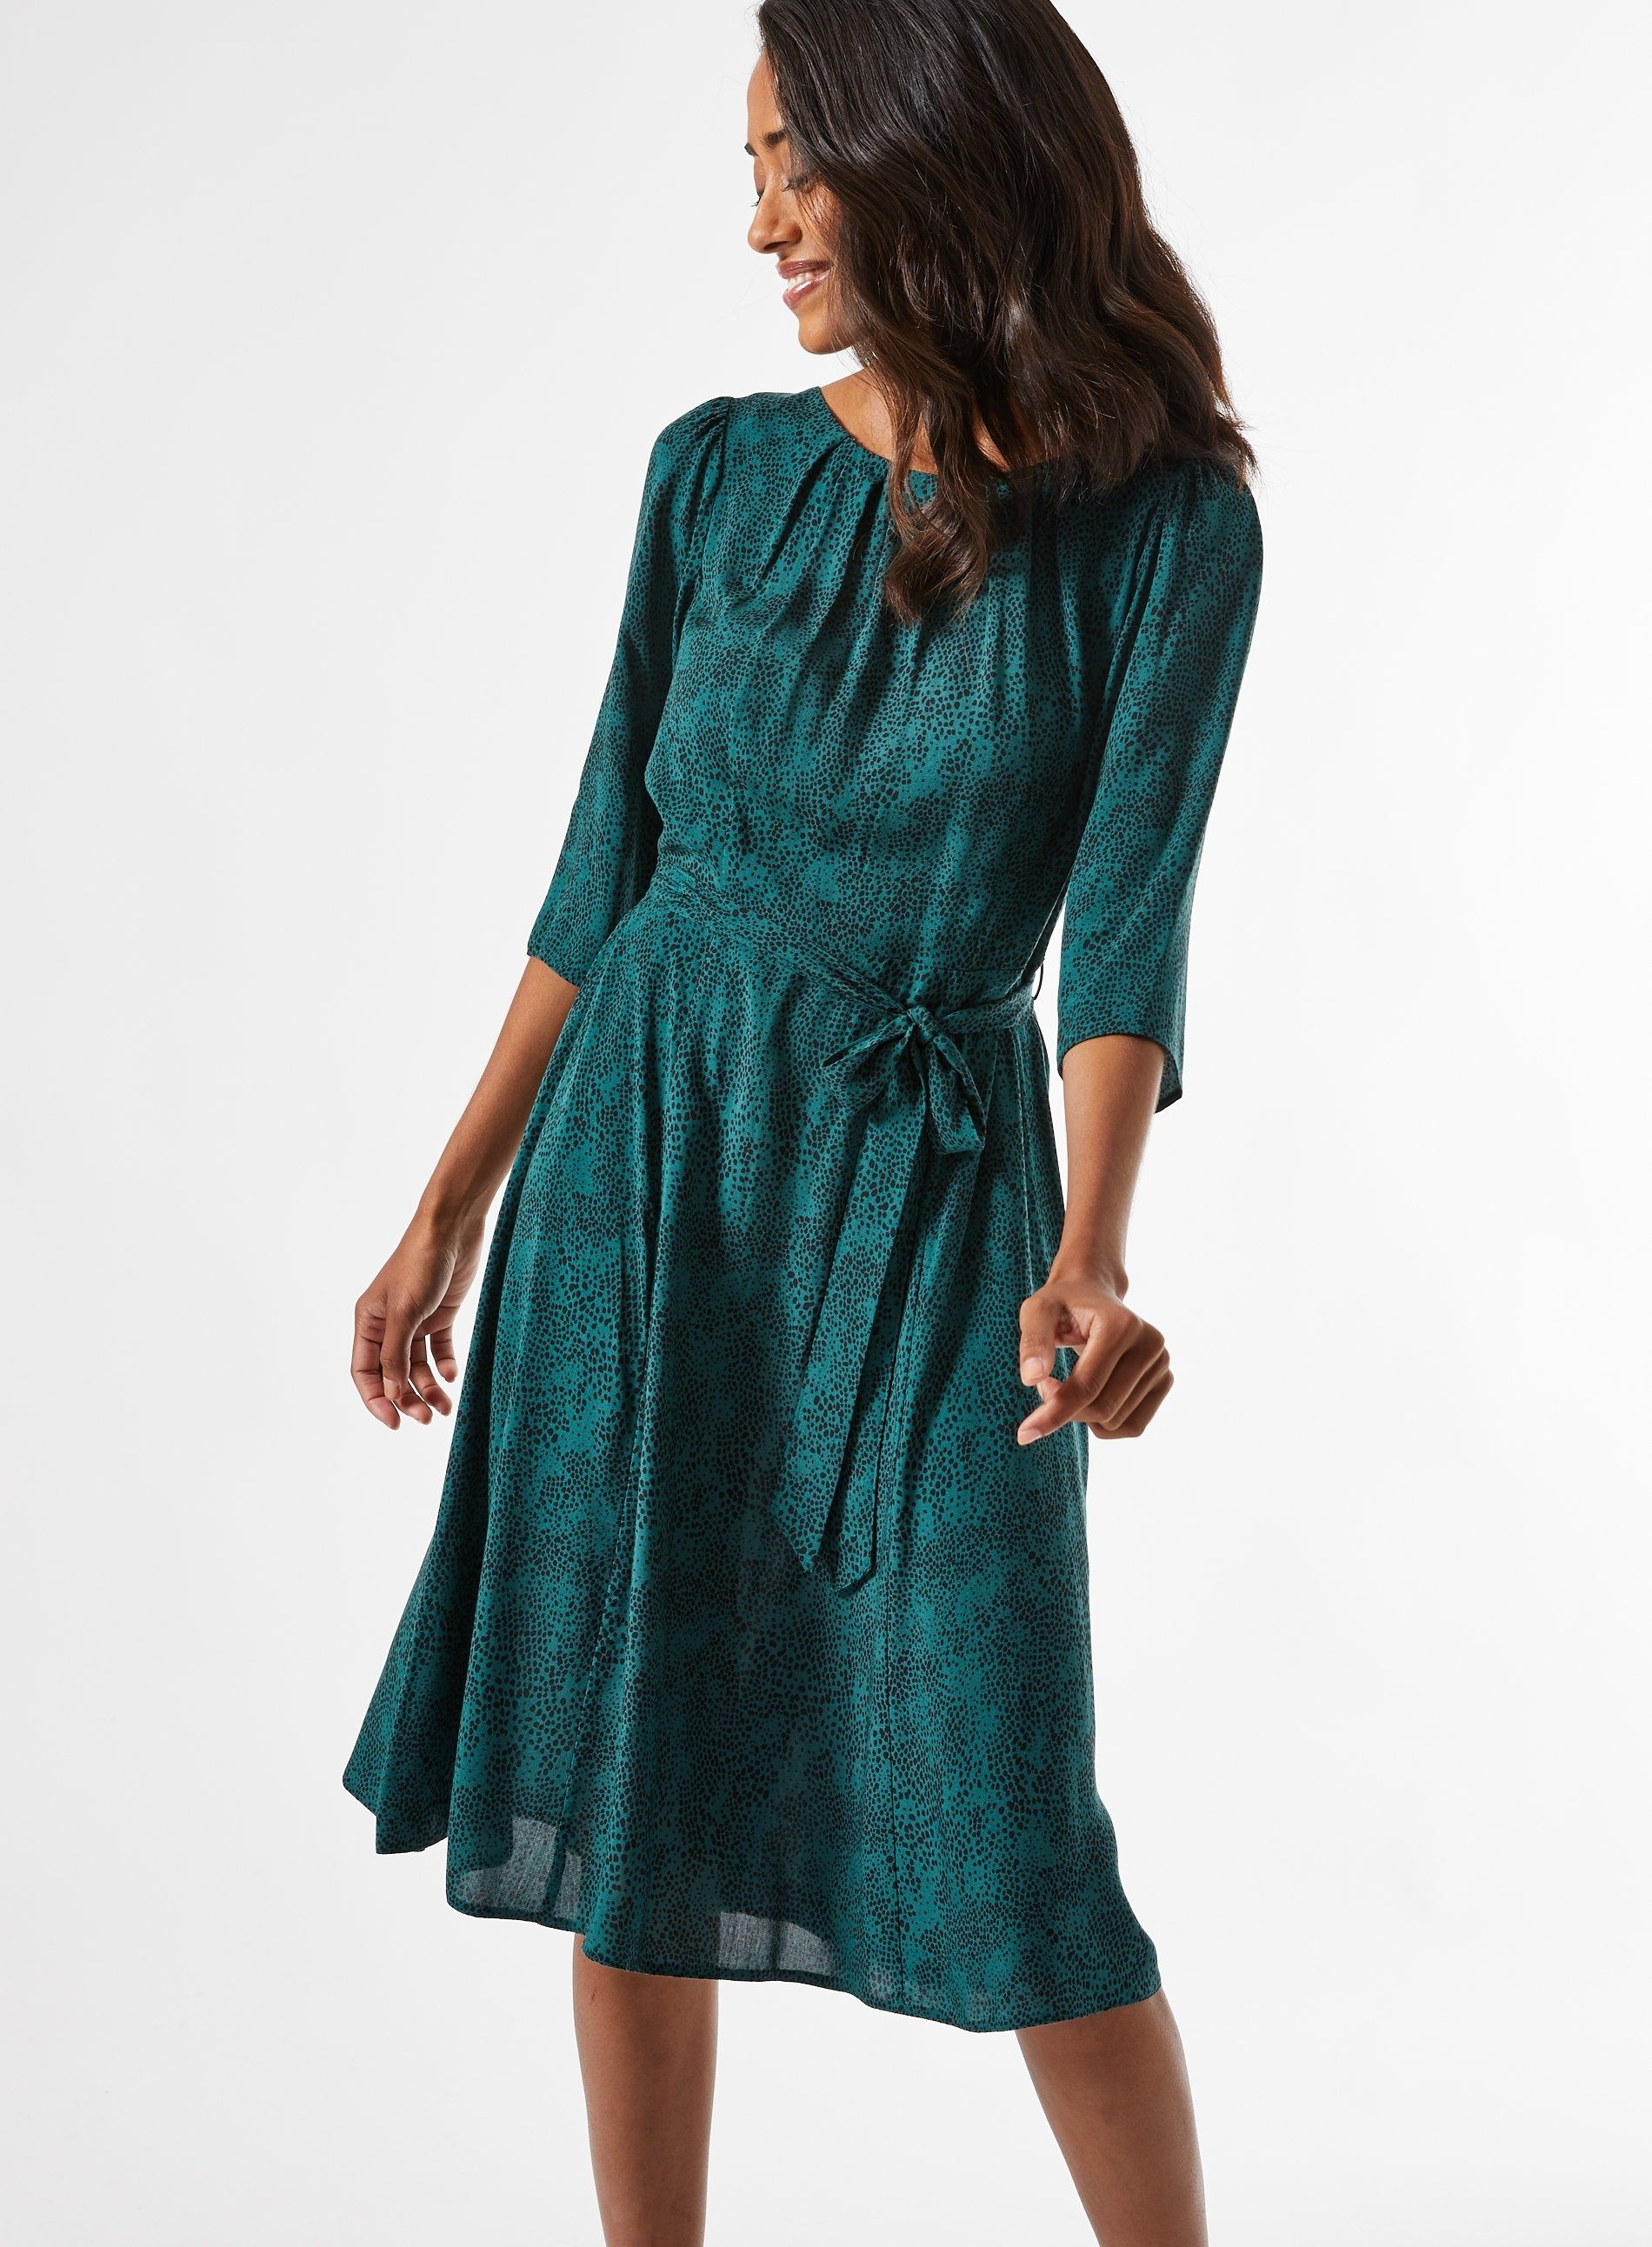 Dorothy Perkins Womens Billie and Blossom Petite Green Midi Dress